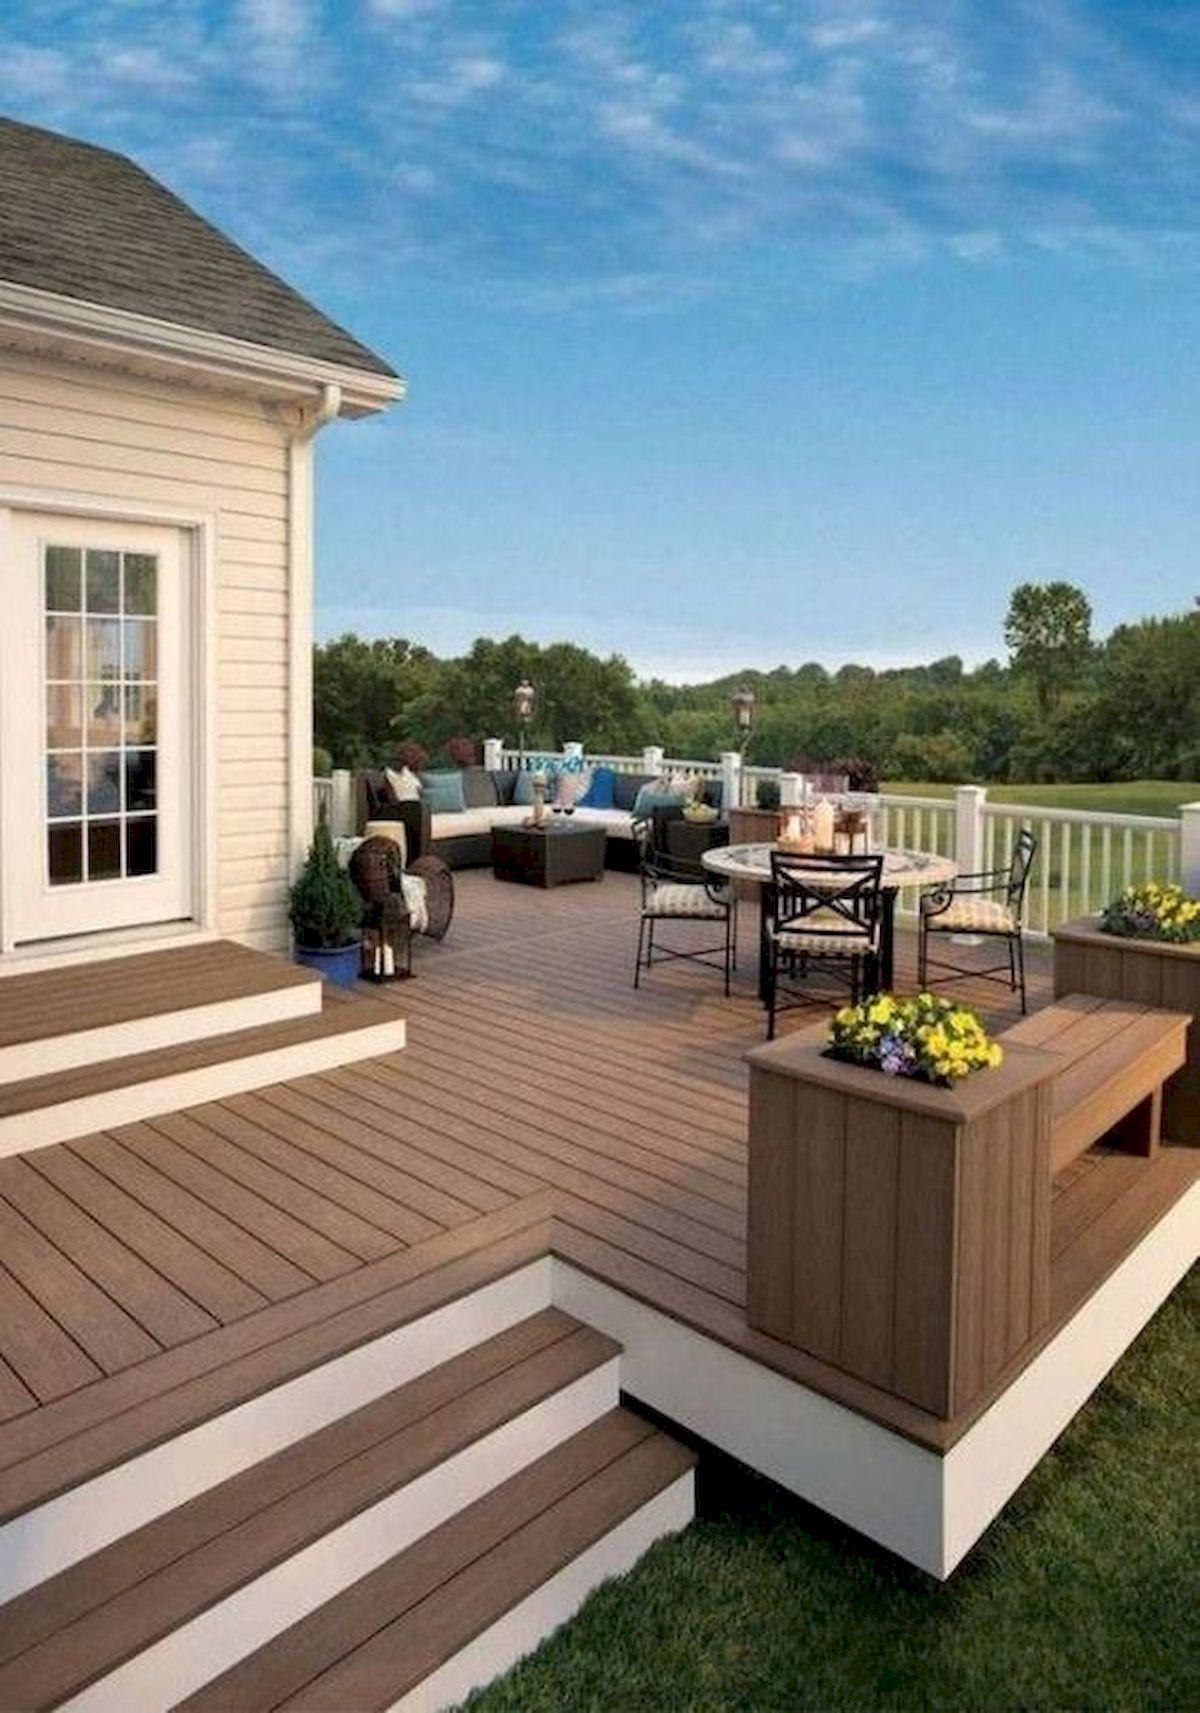 50 Best DIY Backyard Patio and Decking Design Ideas (25)